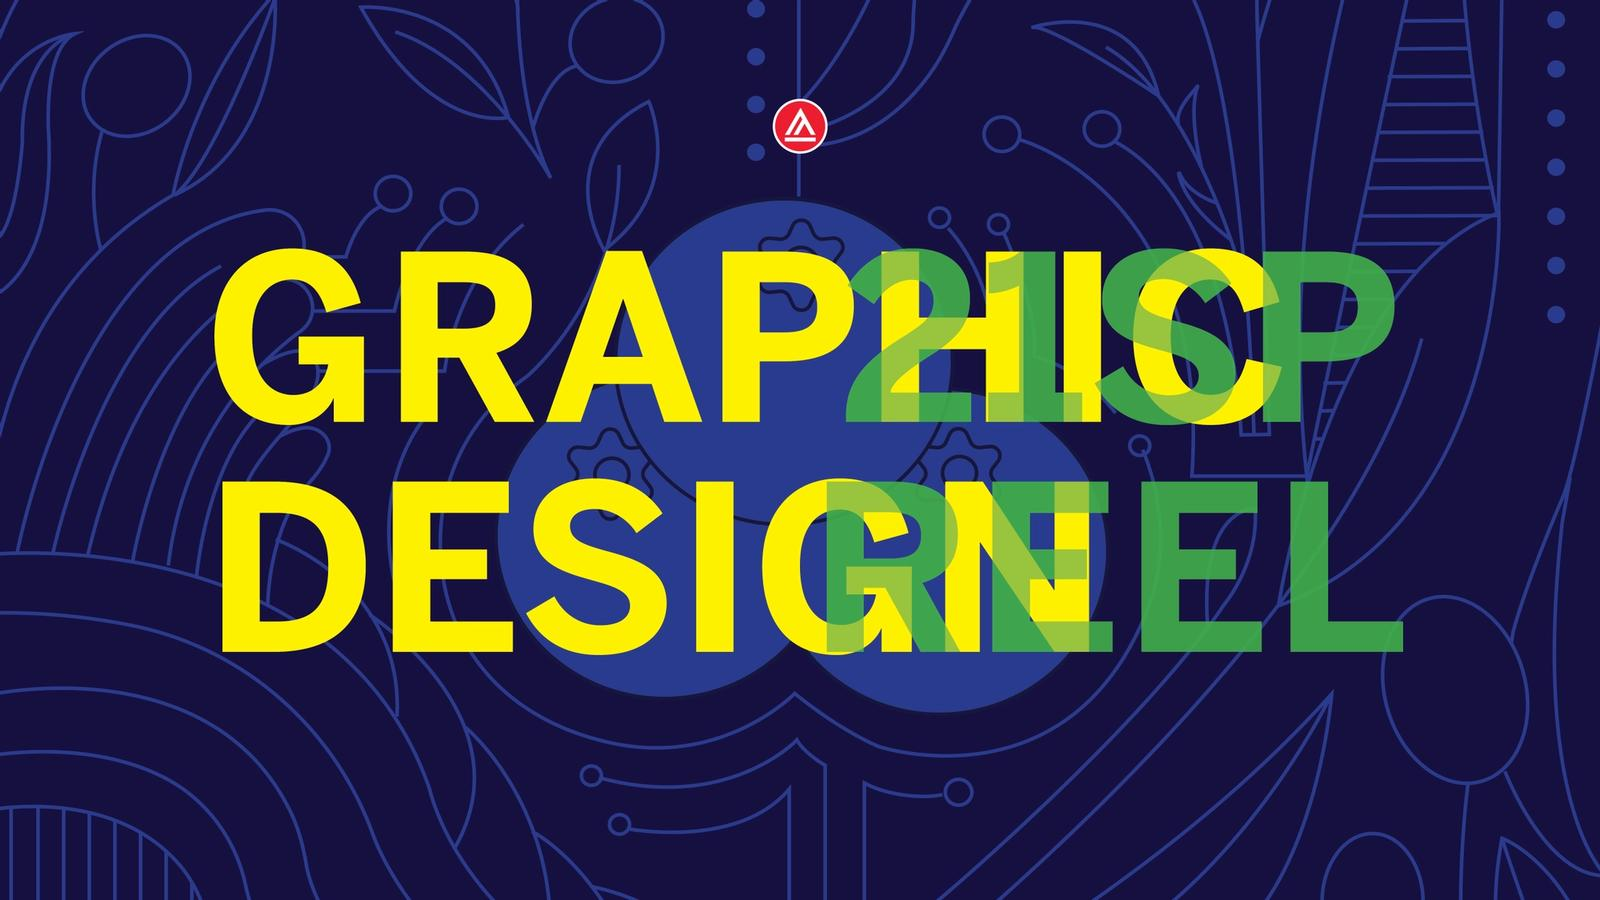 School of Graphic Design Sizzle Reel